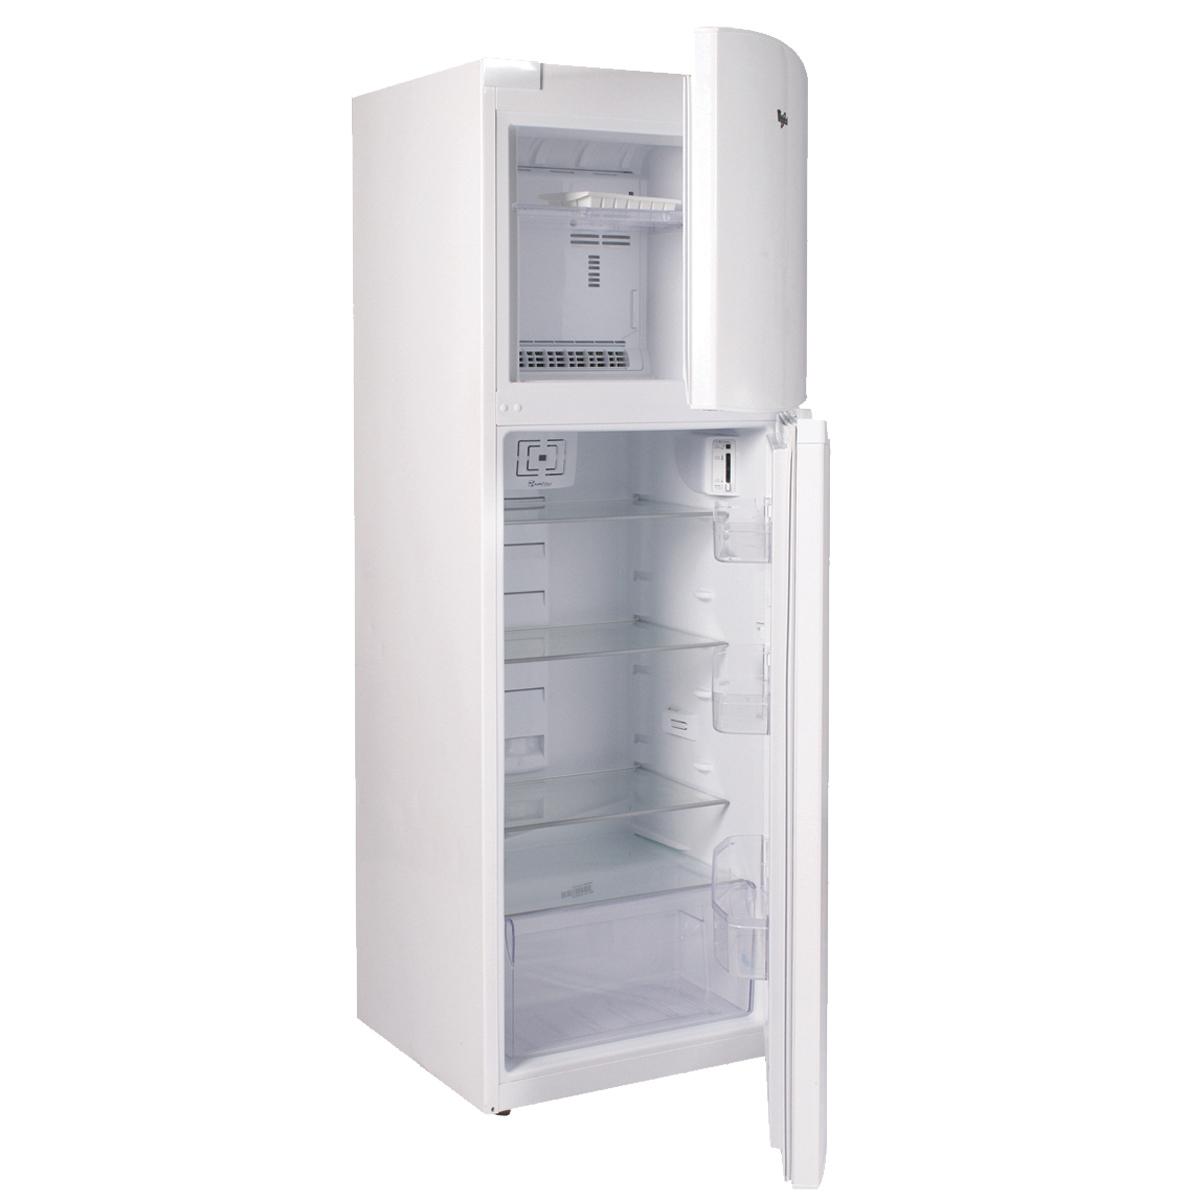 refrigerateur congelateur 280l blanc internation moduling. Black Bedroom Furniture Sets. Home Design Ideas